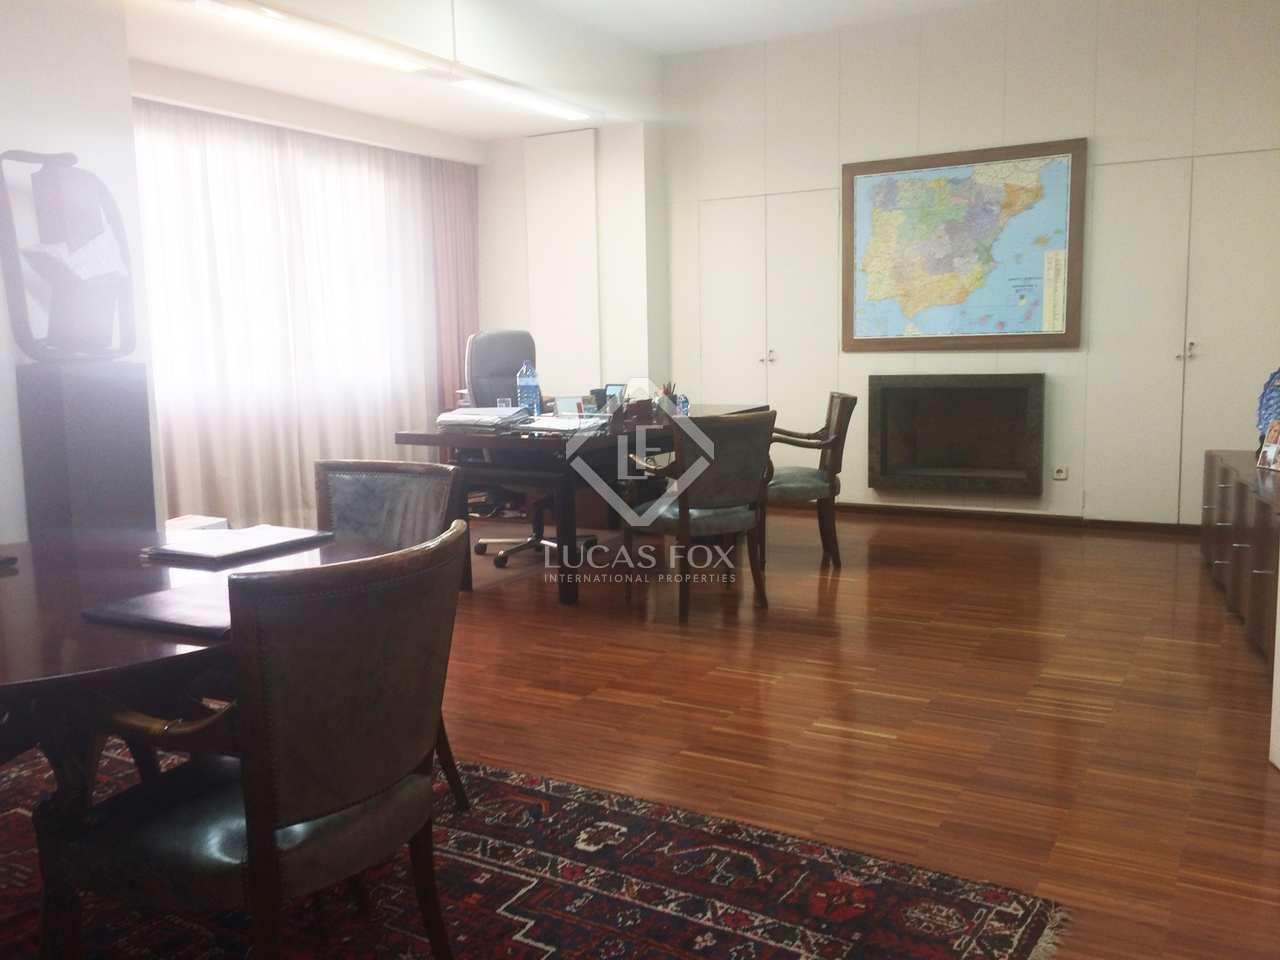 Apartamento de 345m en venta en sant francesc valencia for Oficinas prop valencia